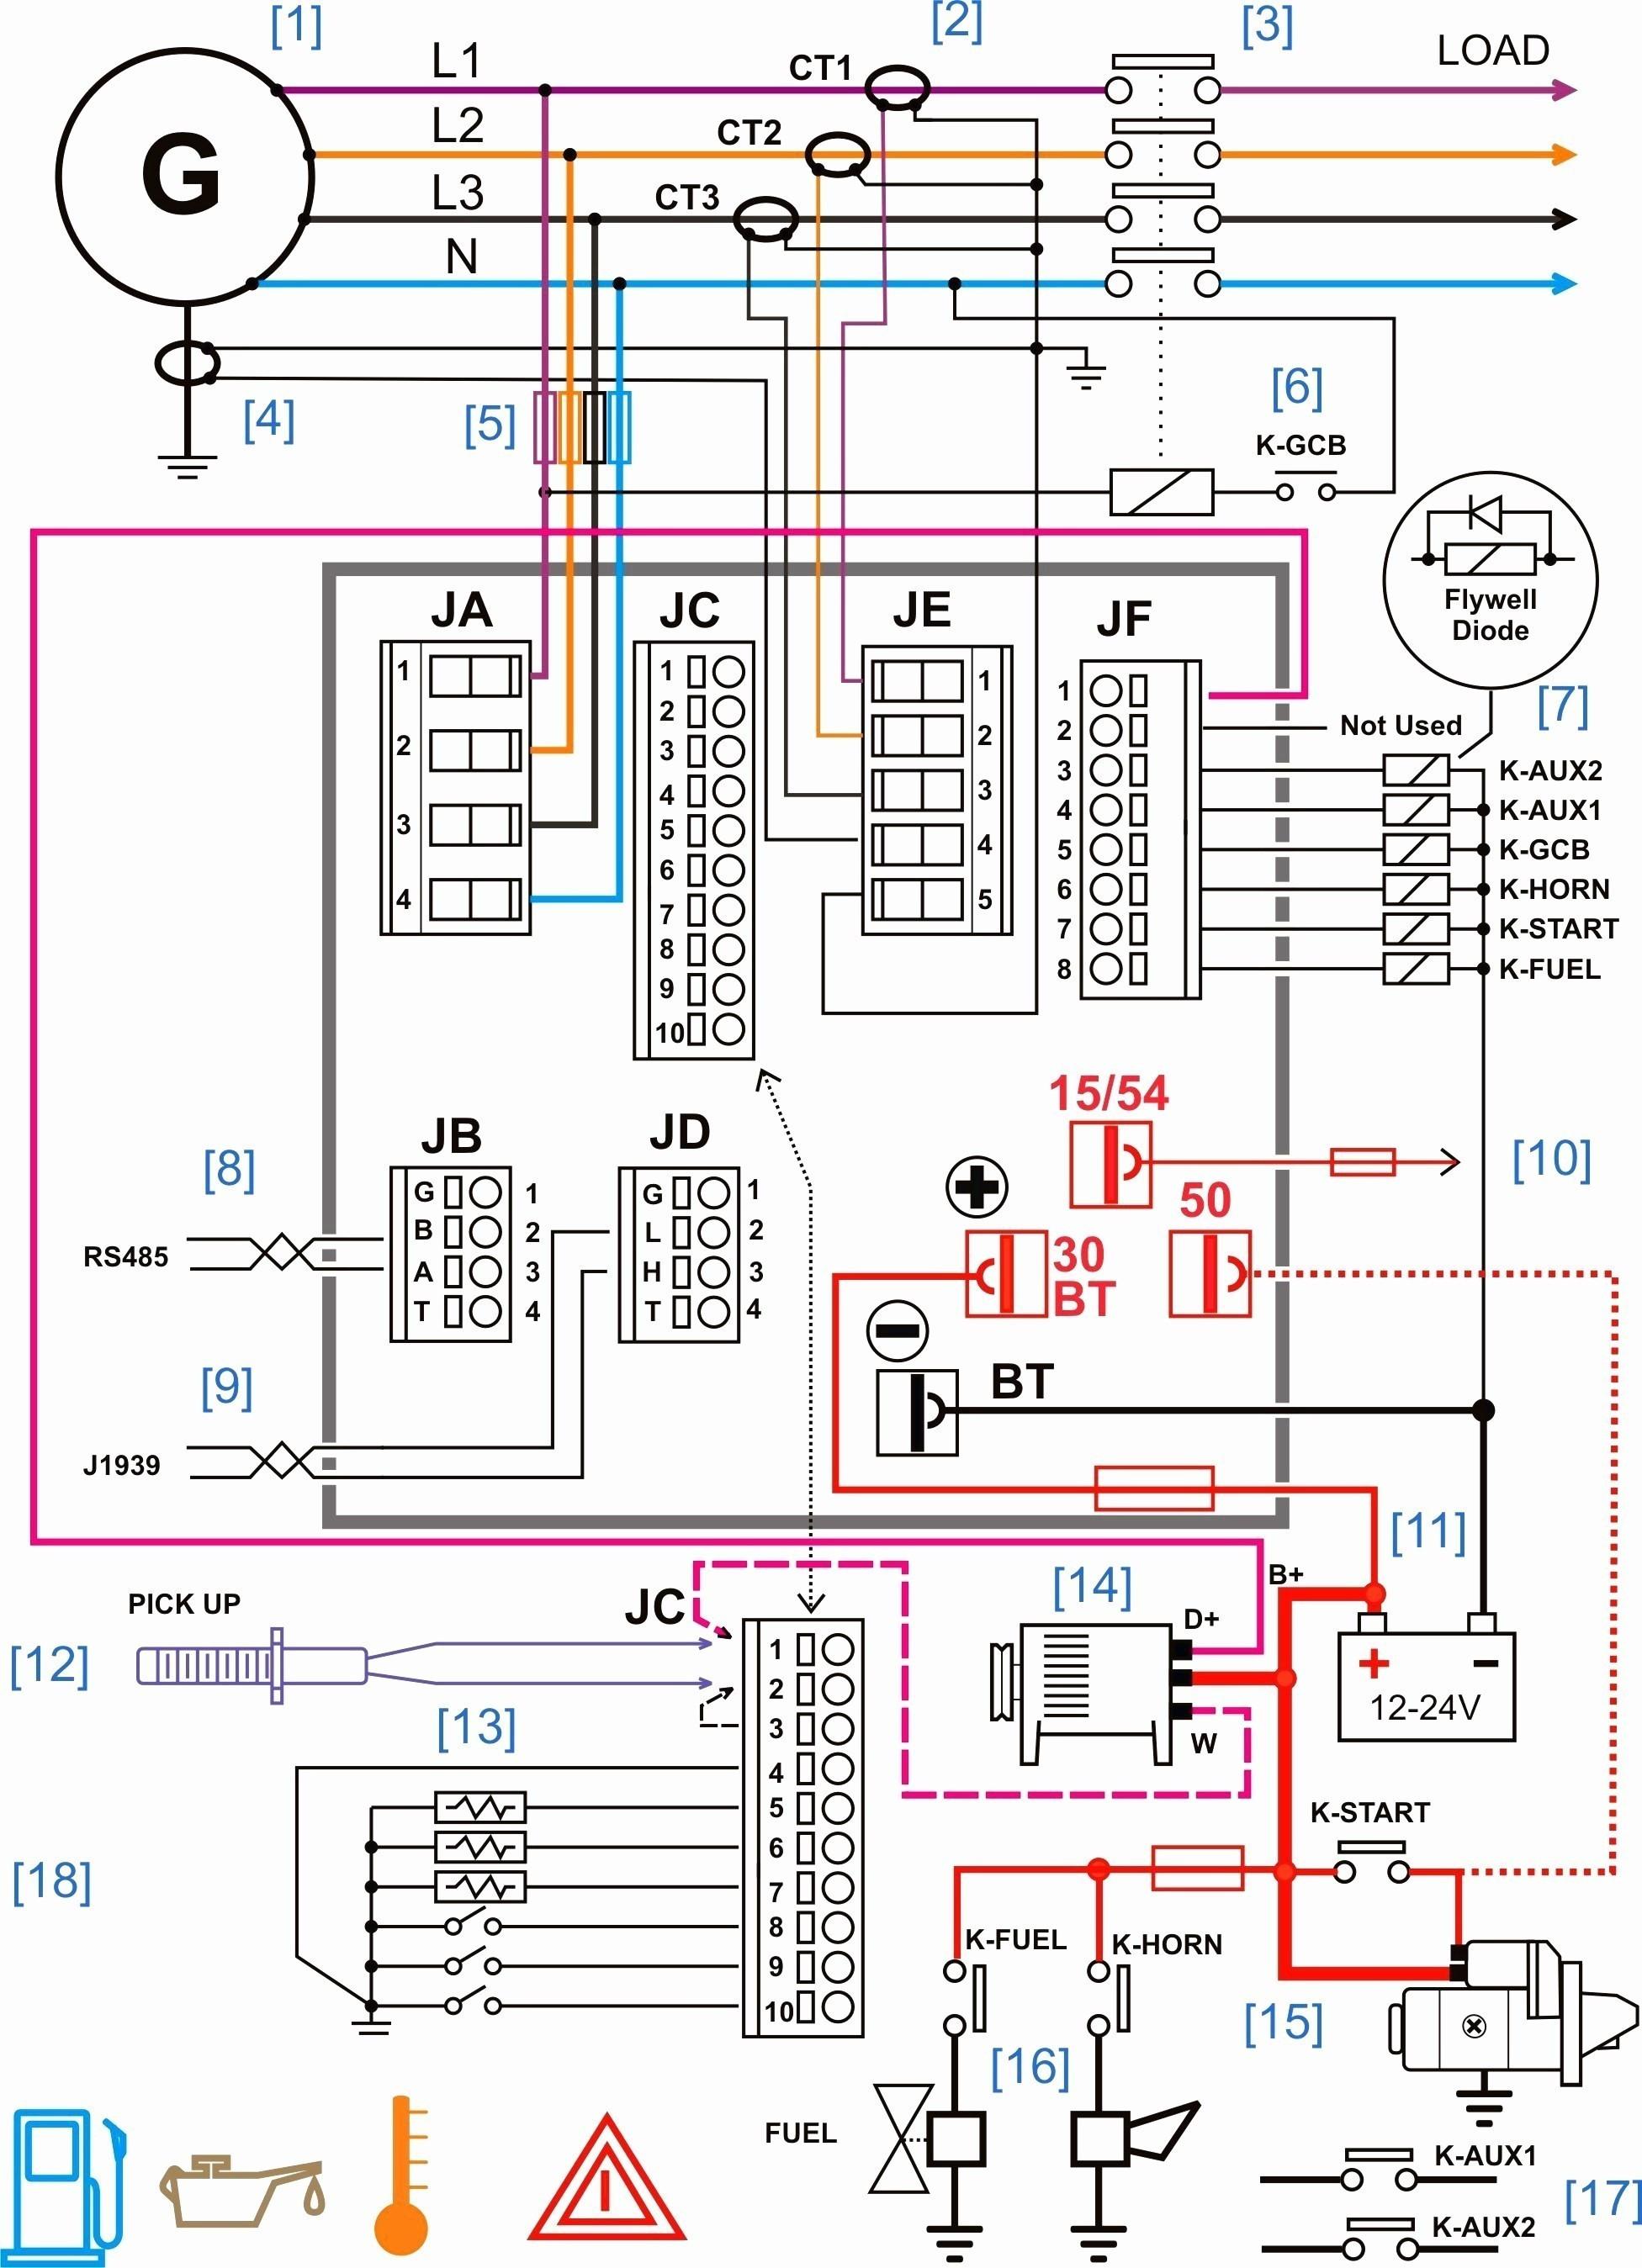 Car Stereo Installation Diagram Wiring Diagram Book Best Wiring Harness Diagram Book Car Stereo Of Car Stereo Installation Diagram